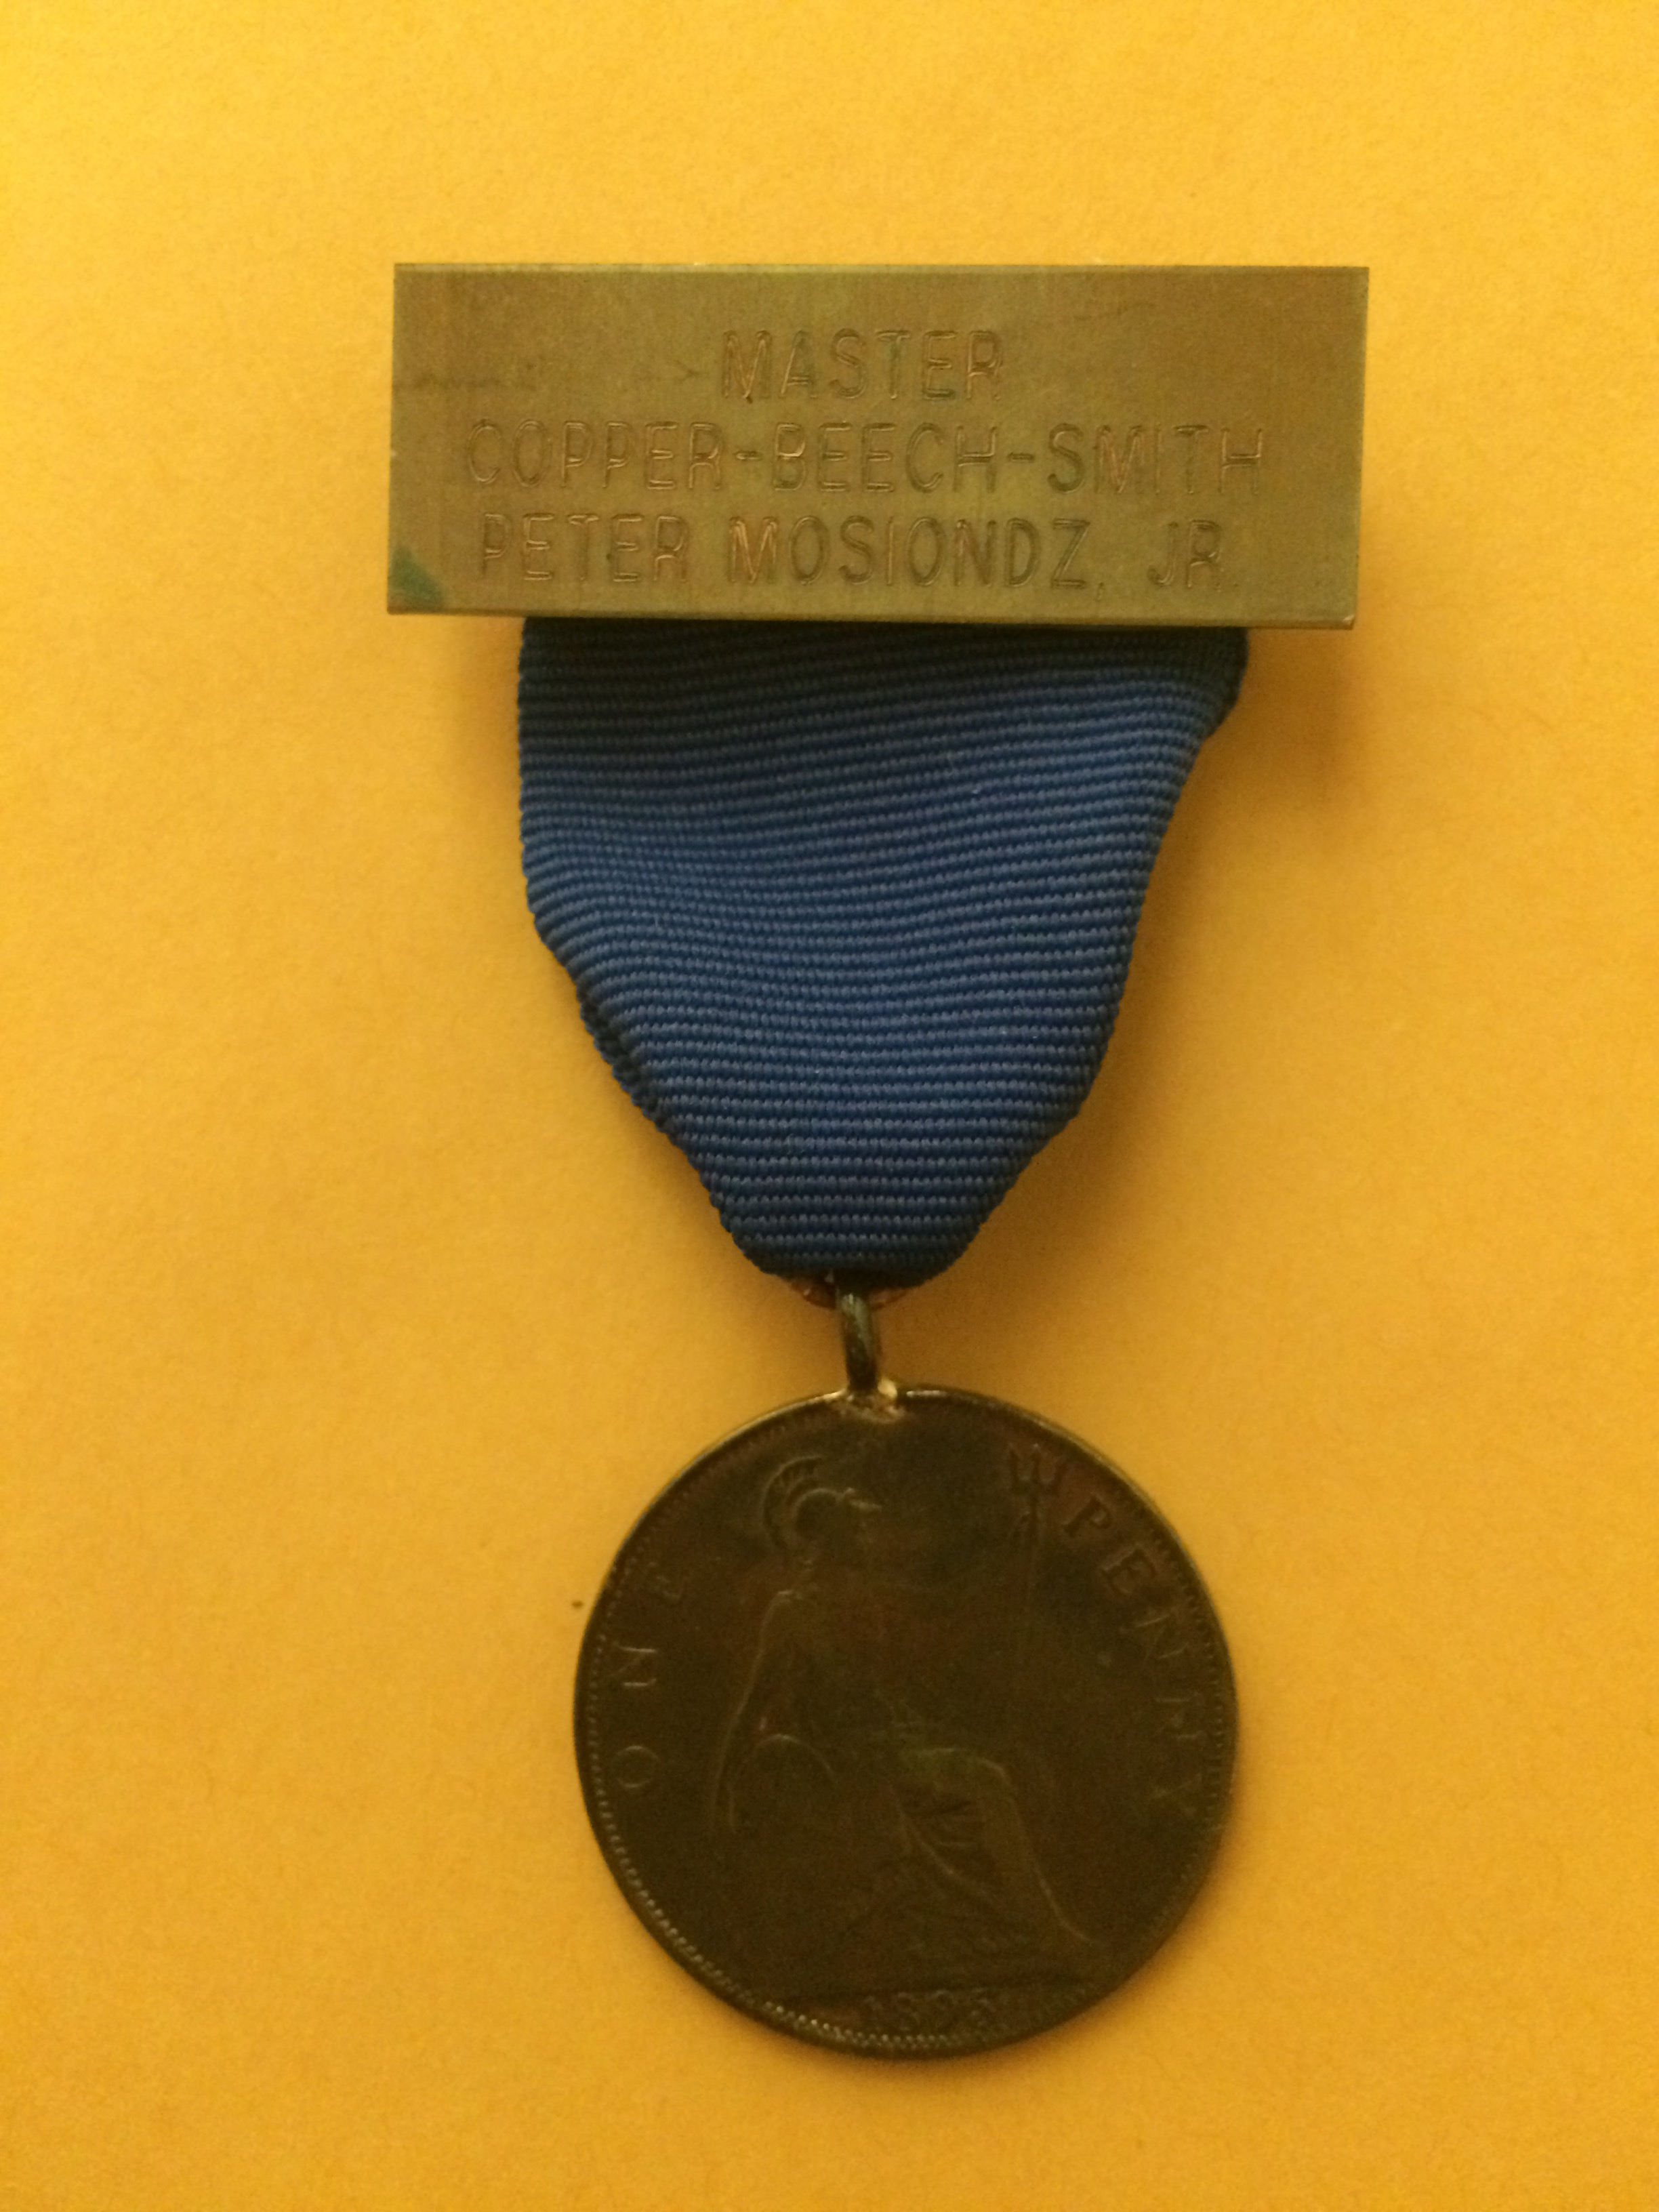 SOCB's Master Copper-Beech-Smith's Badges